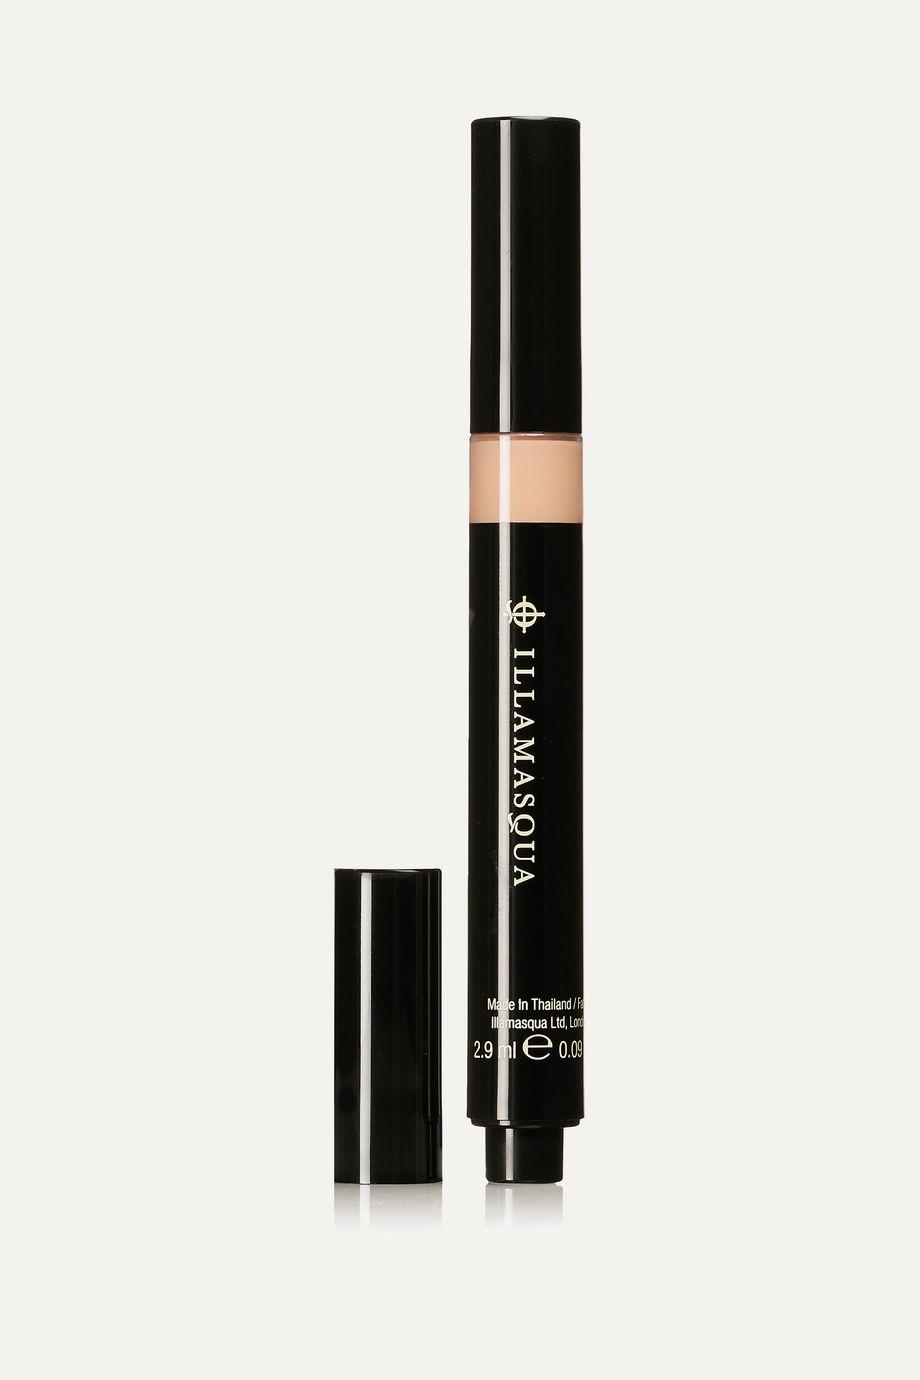 Illamasqua Skin Base Concealer Pen - Light 3